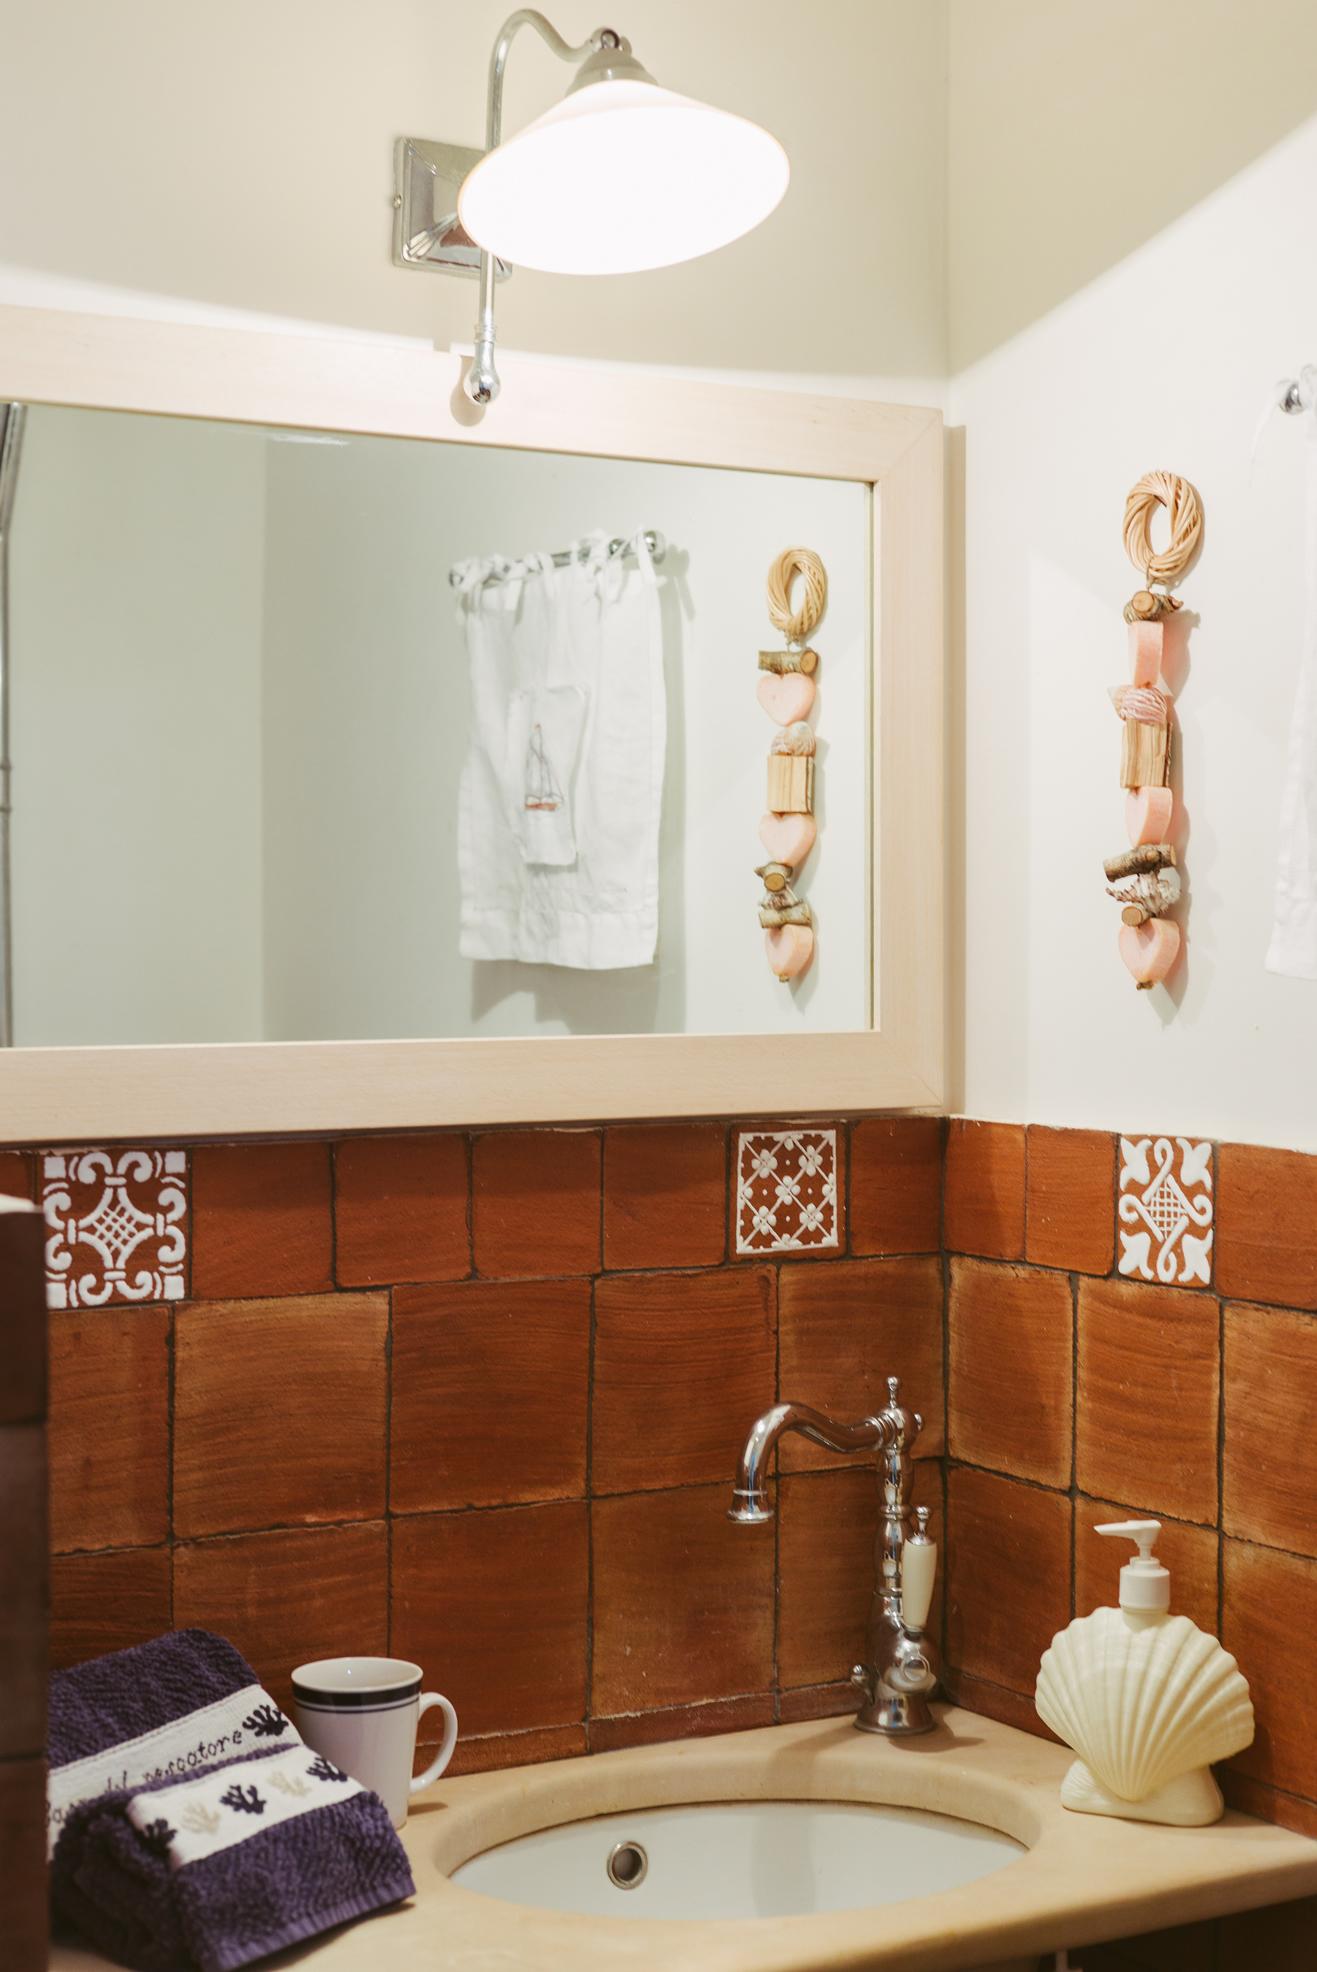 20sampieri-casa-vacanze-sicilia-appartamento-sicily-holiday-apartment-casa-del-pescatore-italia-italy.jpg